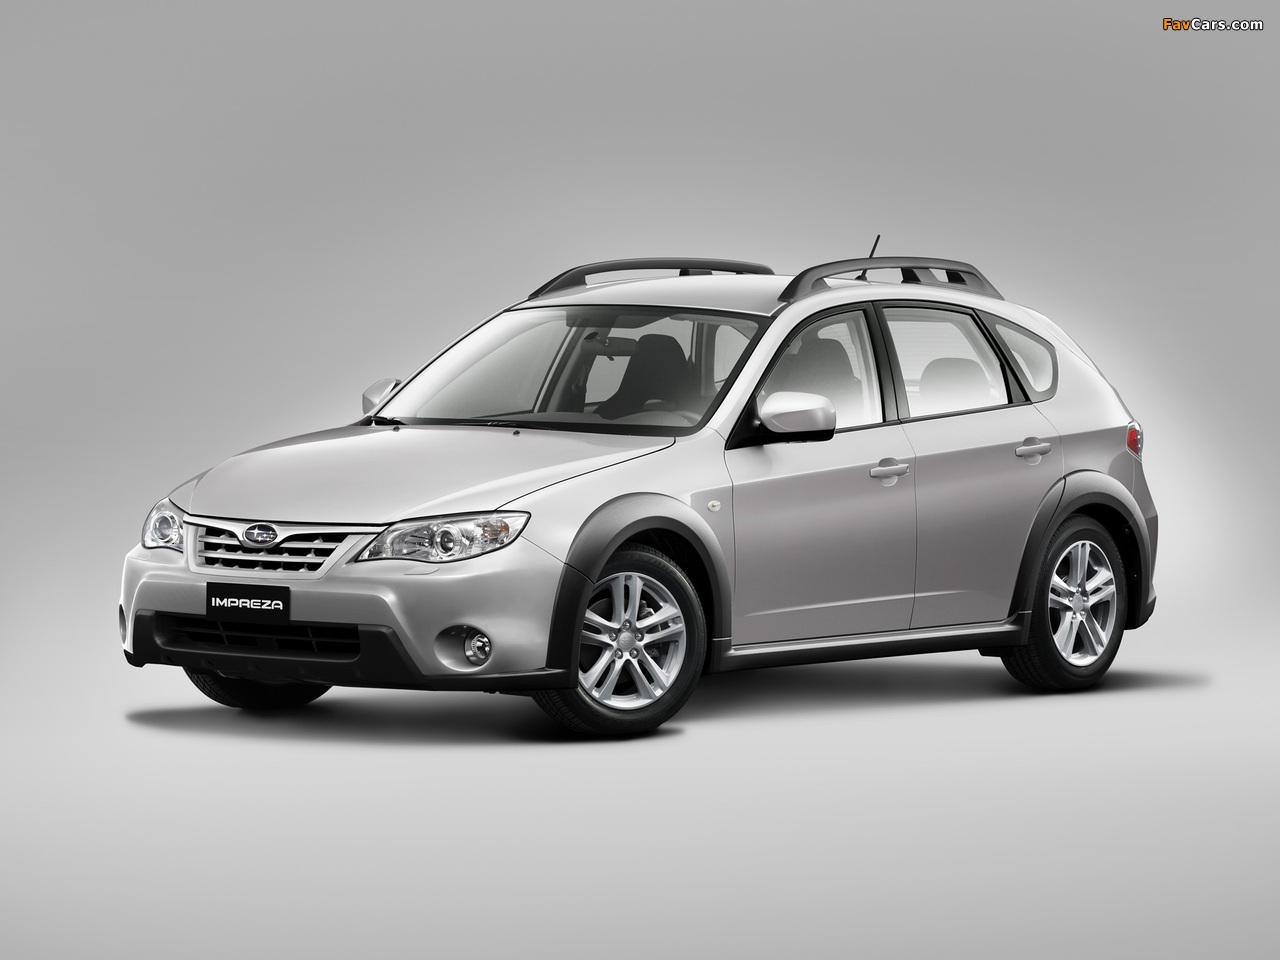 Subaru Impreza XV 2.0X 2010–11 pictures (1280 x 960)